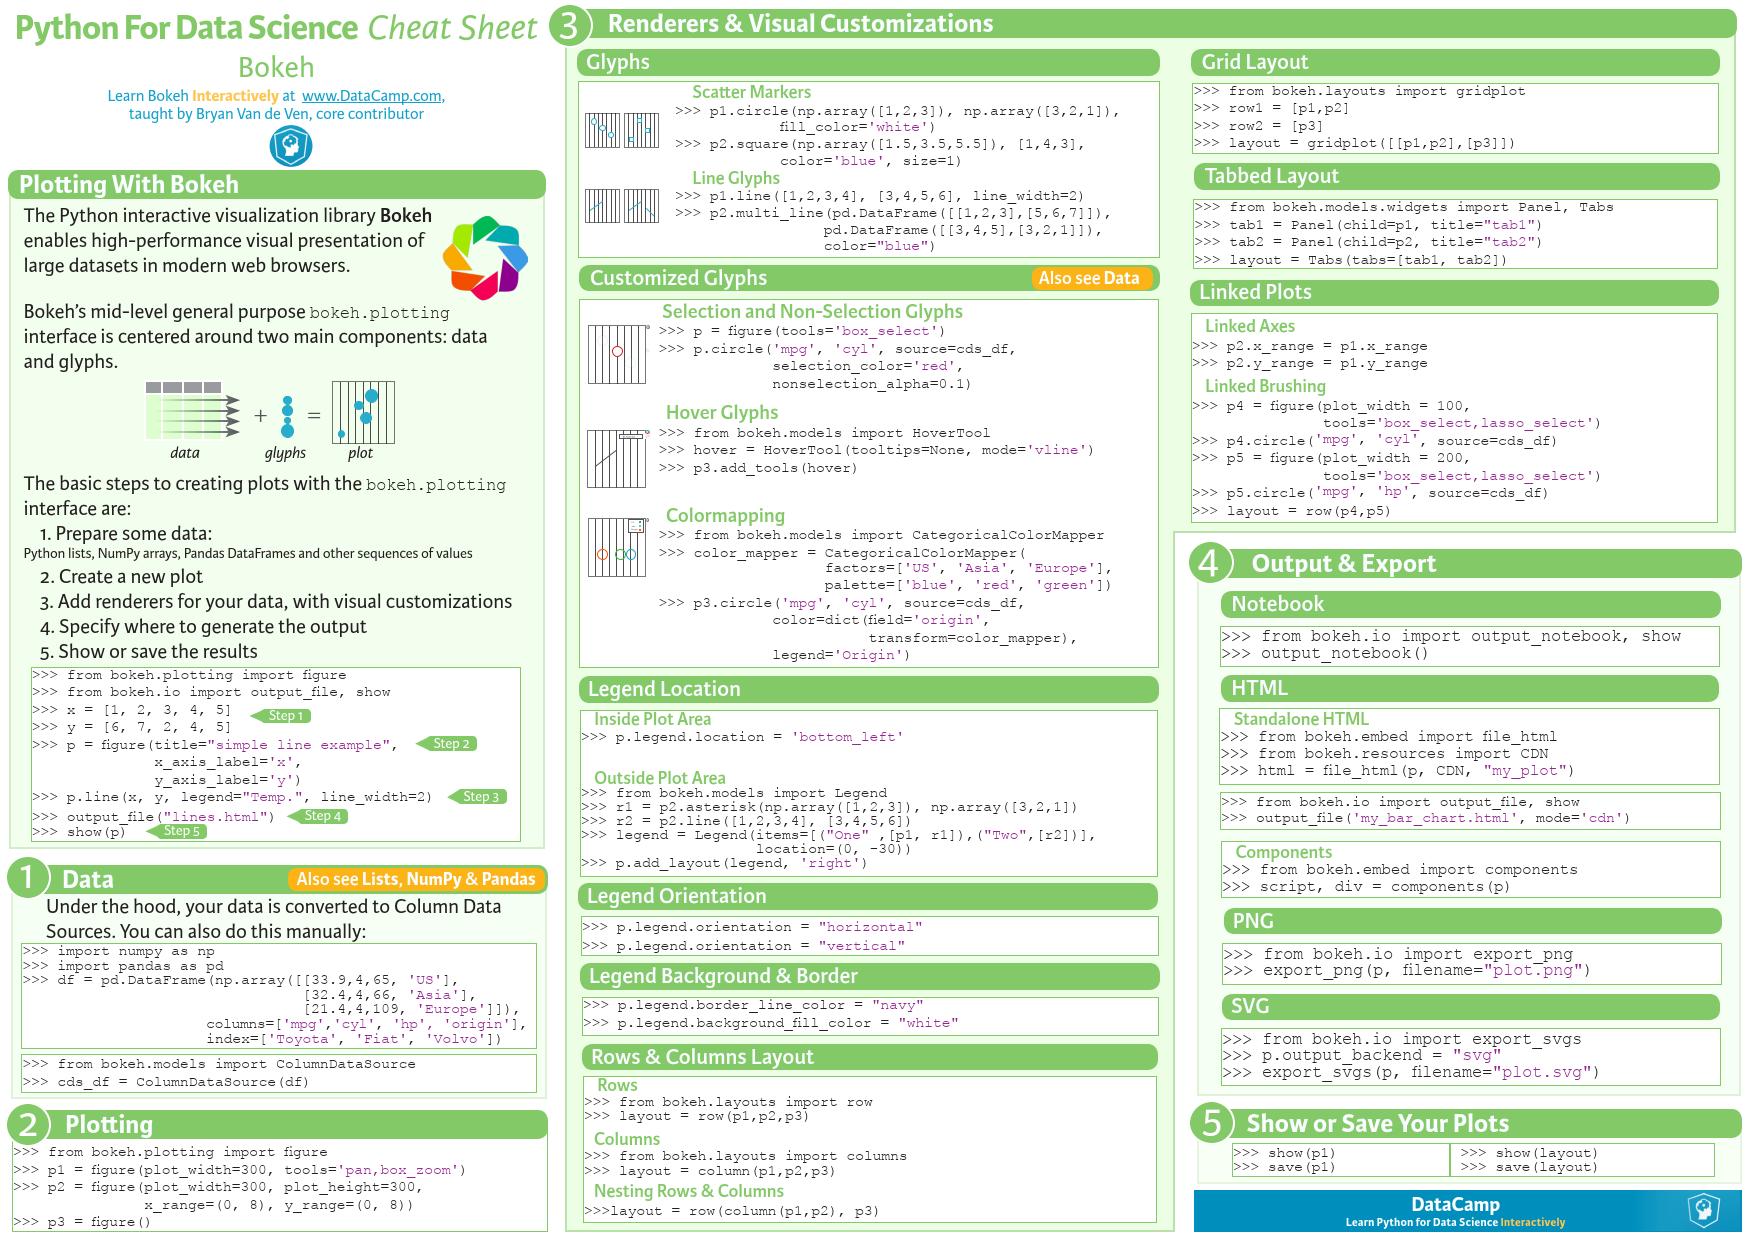 Bokeh Visualization - Python for Data Science [Cheat Sheet] | Credit